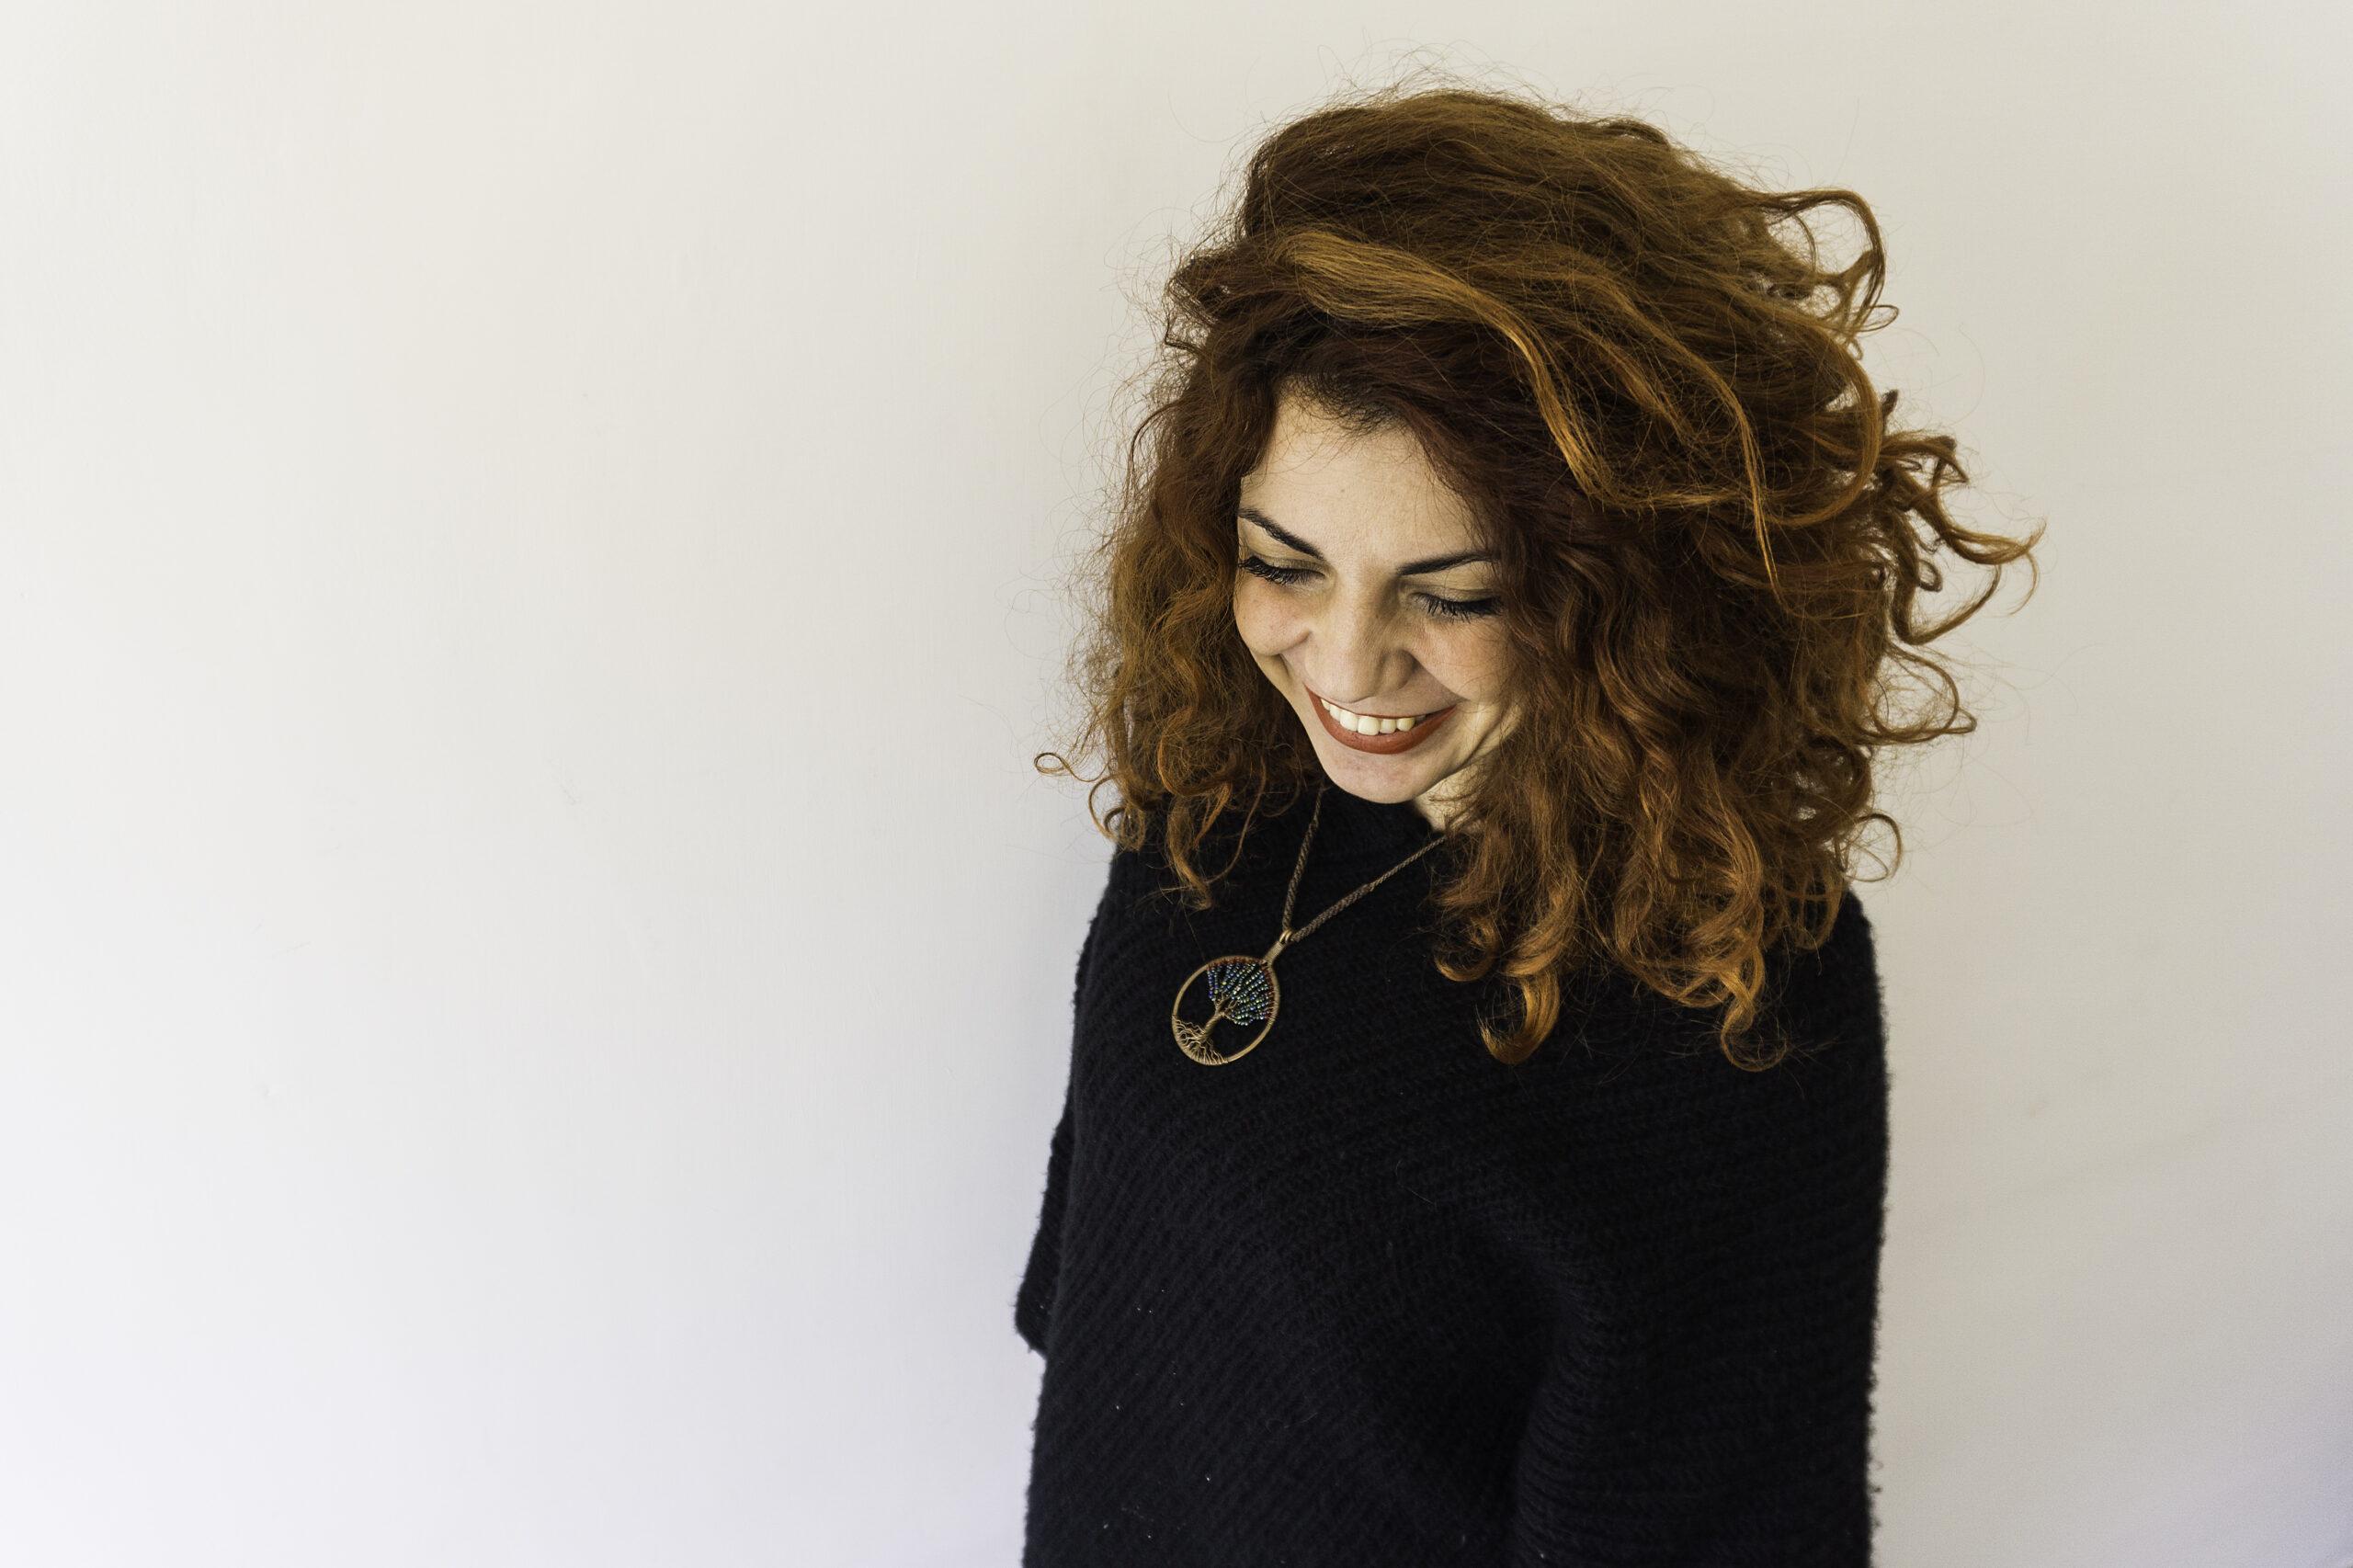 https://www.destinarti.it/wp-content/uploads/2020/02/Giorgia-in-piedi-sorridente-scaled.jpg